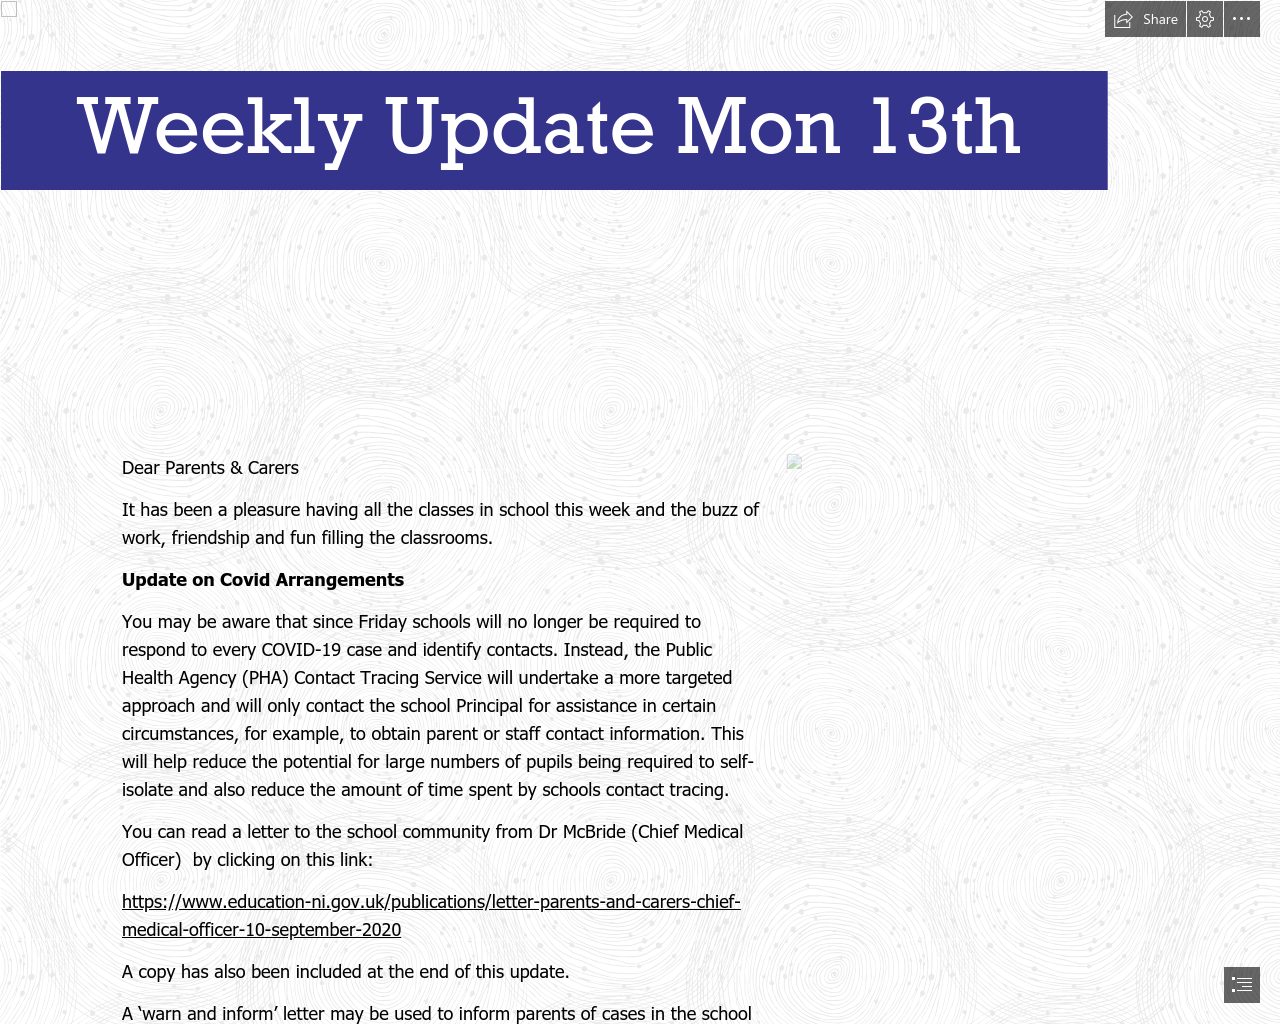 Weekly Update 13th September 2021